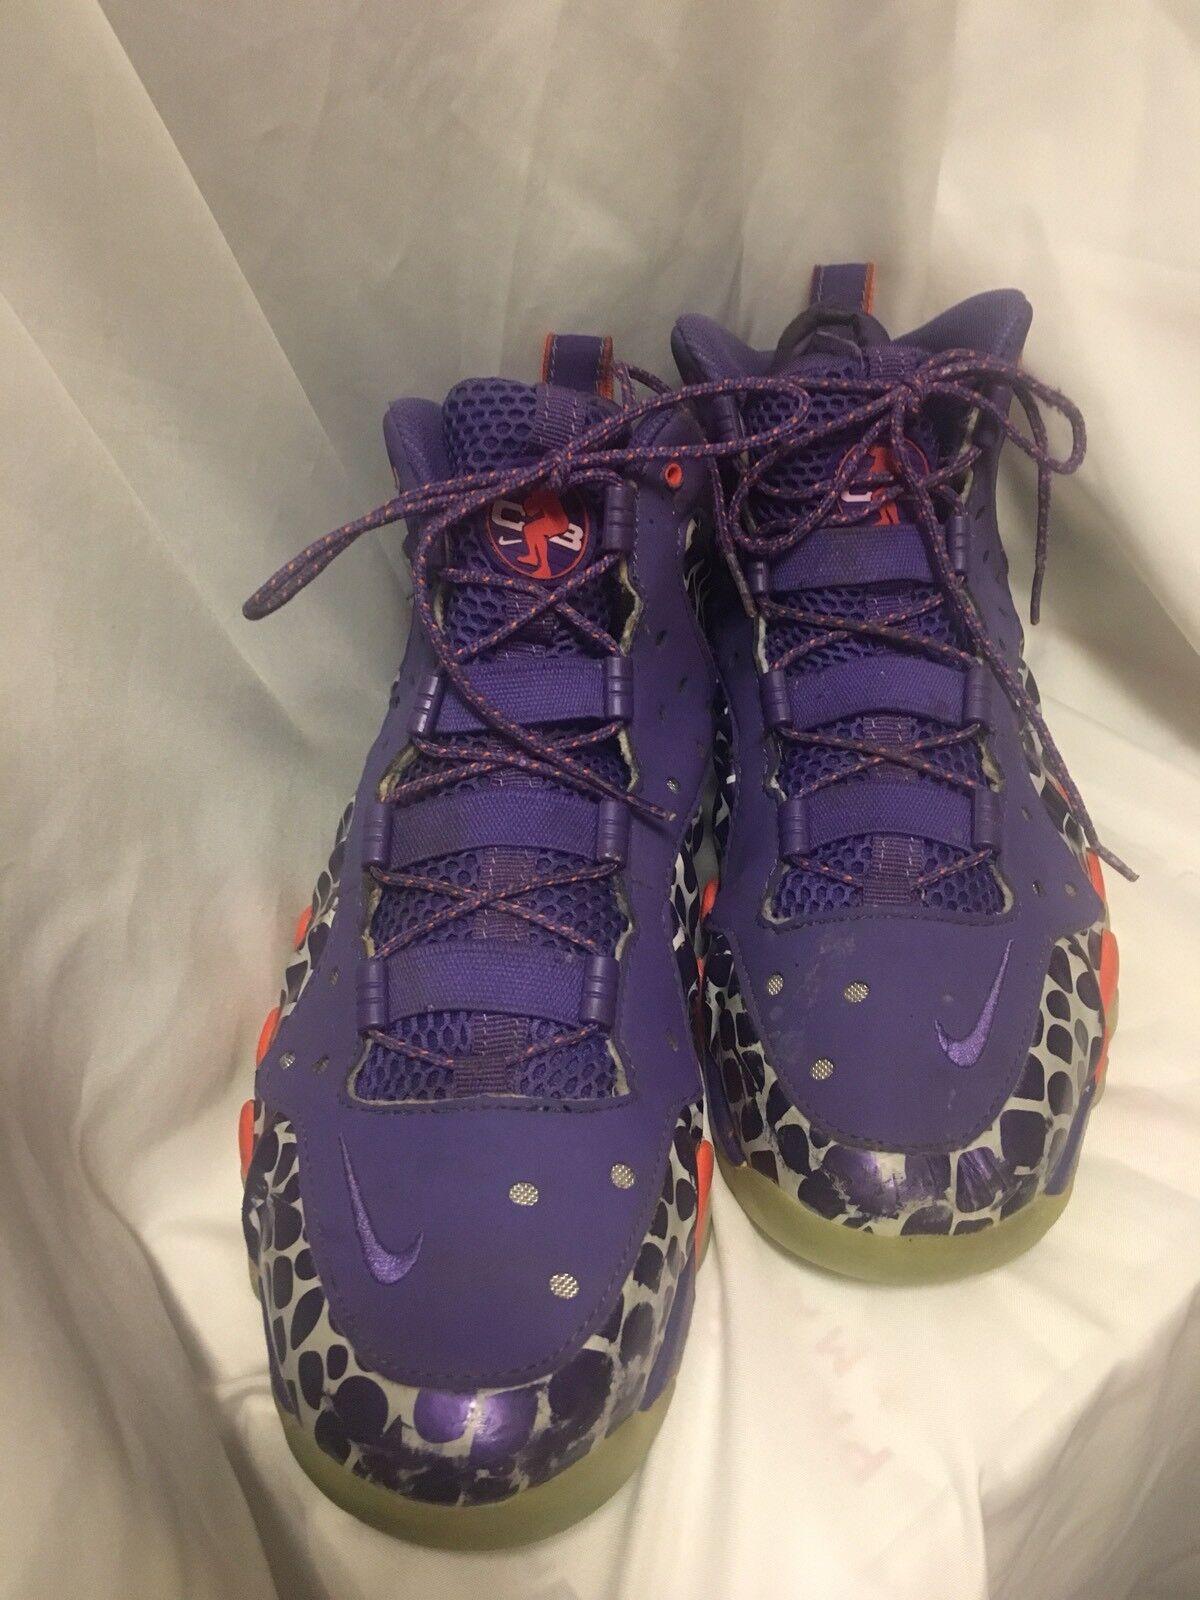 Nike Barkley Posite Max Court Purple/Team Orange Phoenix Suns 555097-581 Sz 11